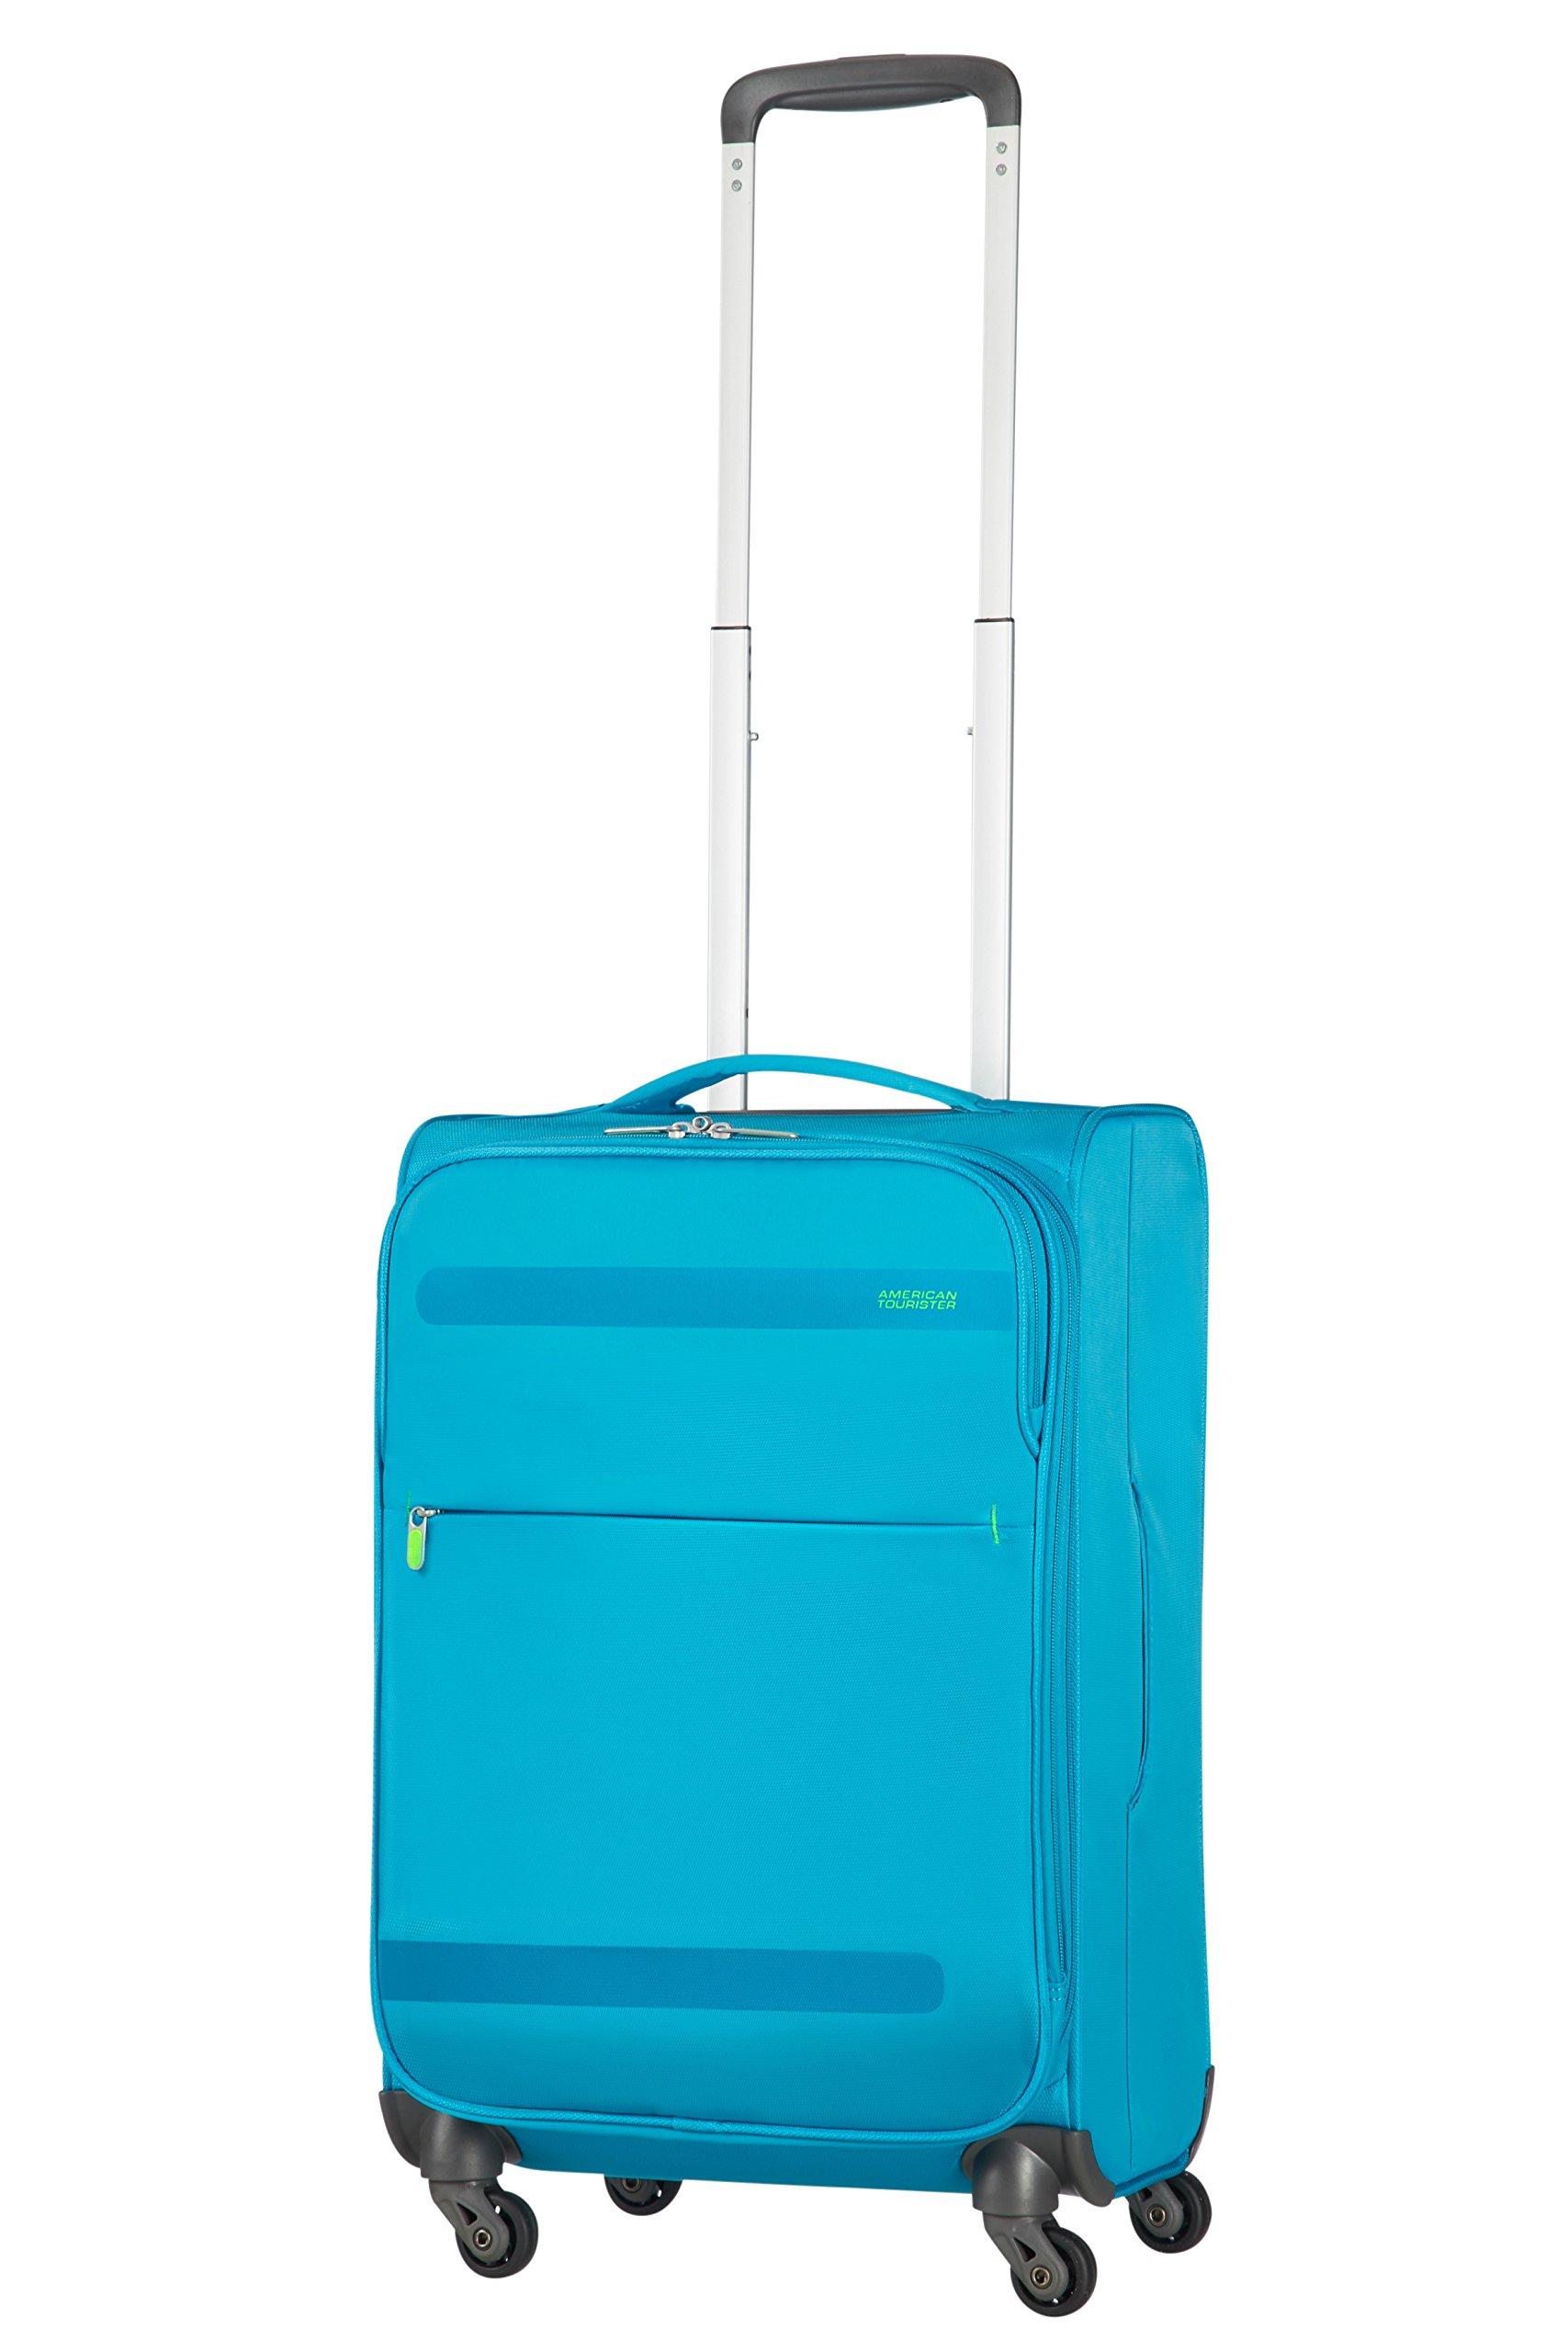 71wNk6xOh6L - American Tourister Herolite Maleta, Azul (MIDNIGHT BLUE), S EXP (55cm-42L)